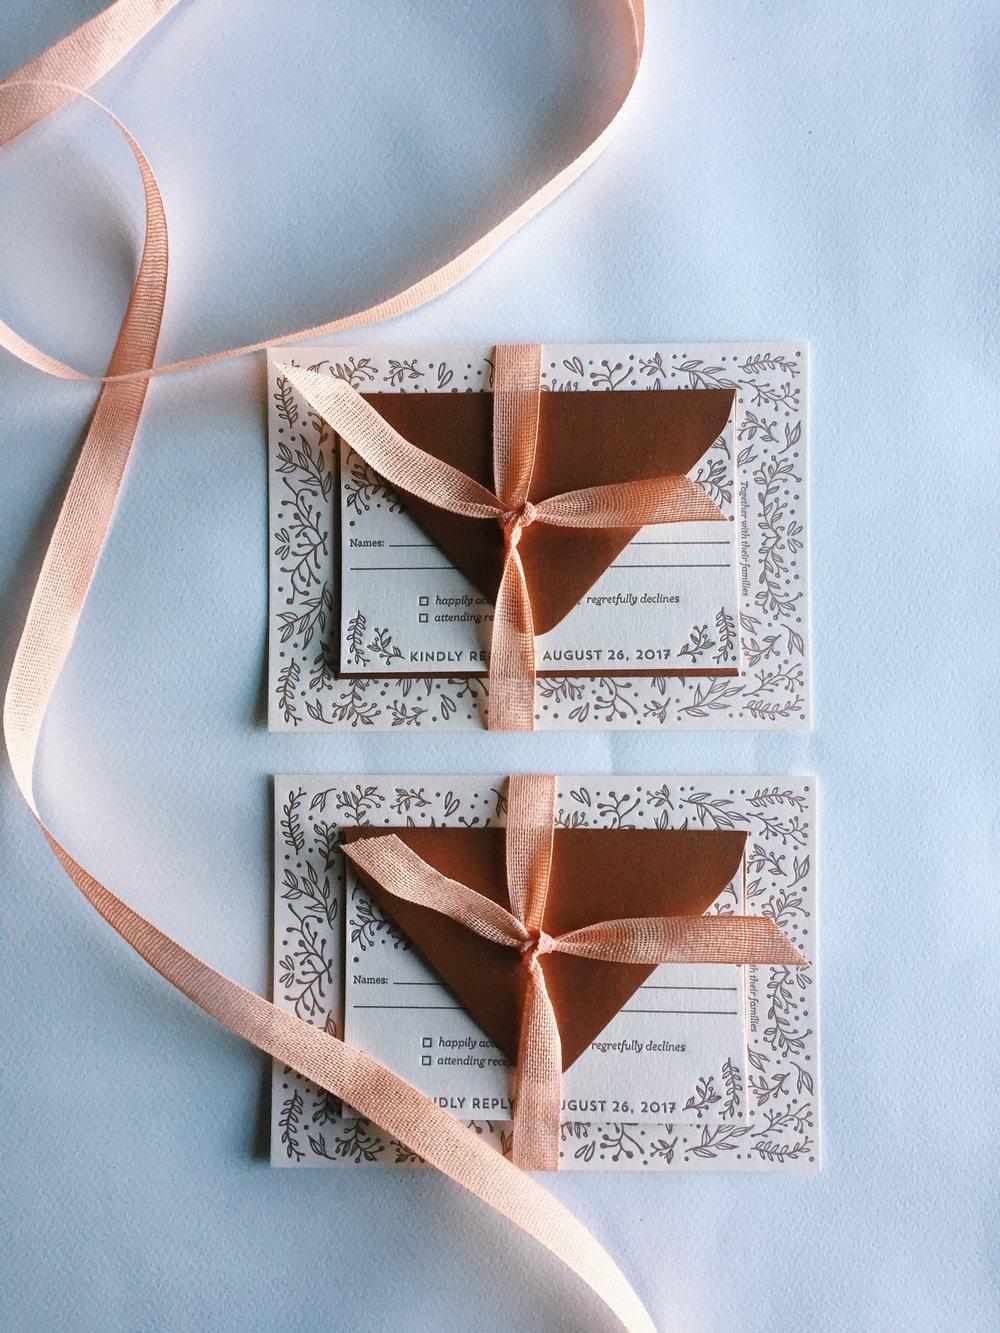 naomipaperco-wedding-invitation9.JPG